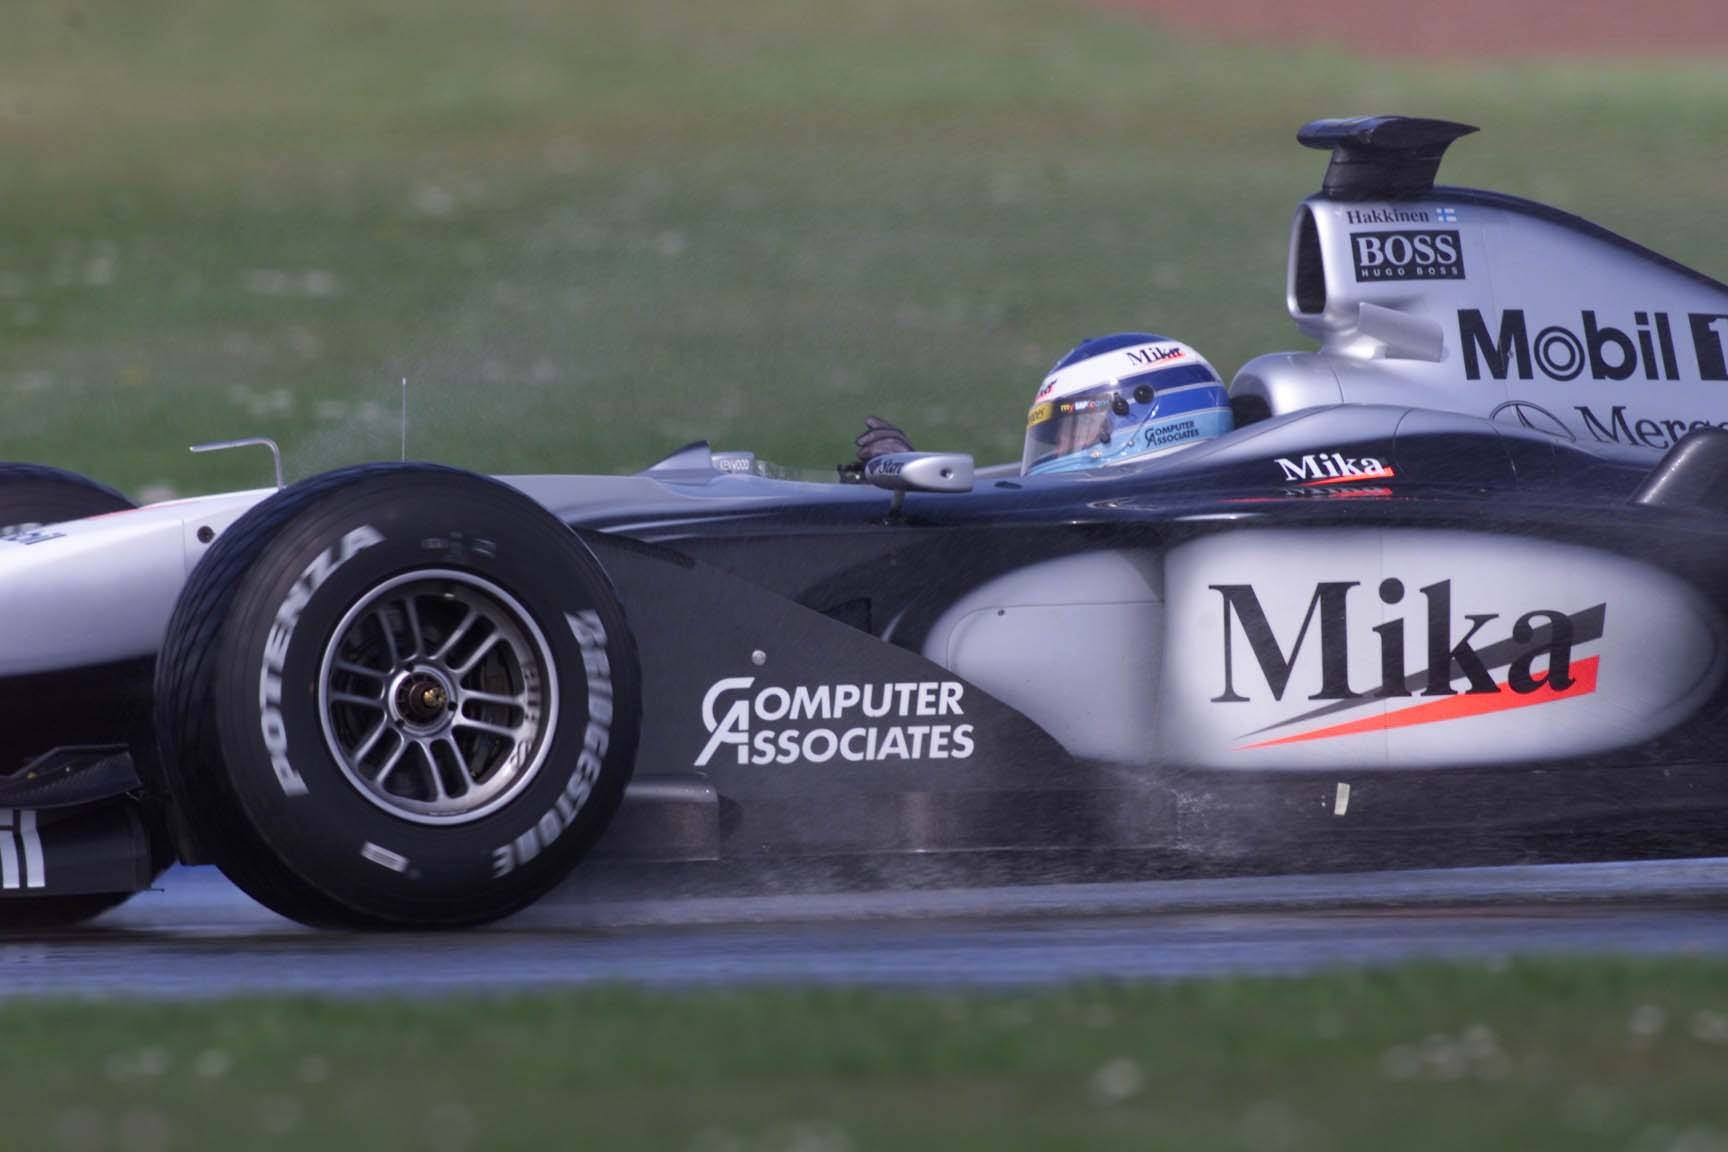 04 British Grand Prix United Kingdom Silverstone Circuit, Silverstone gran bretana silverstone...jpg